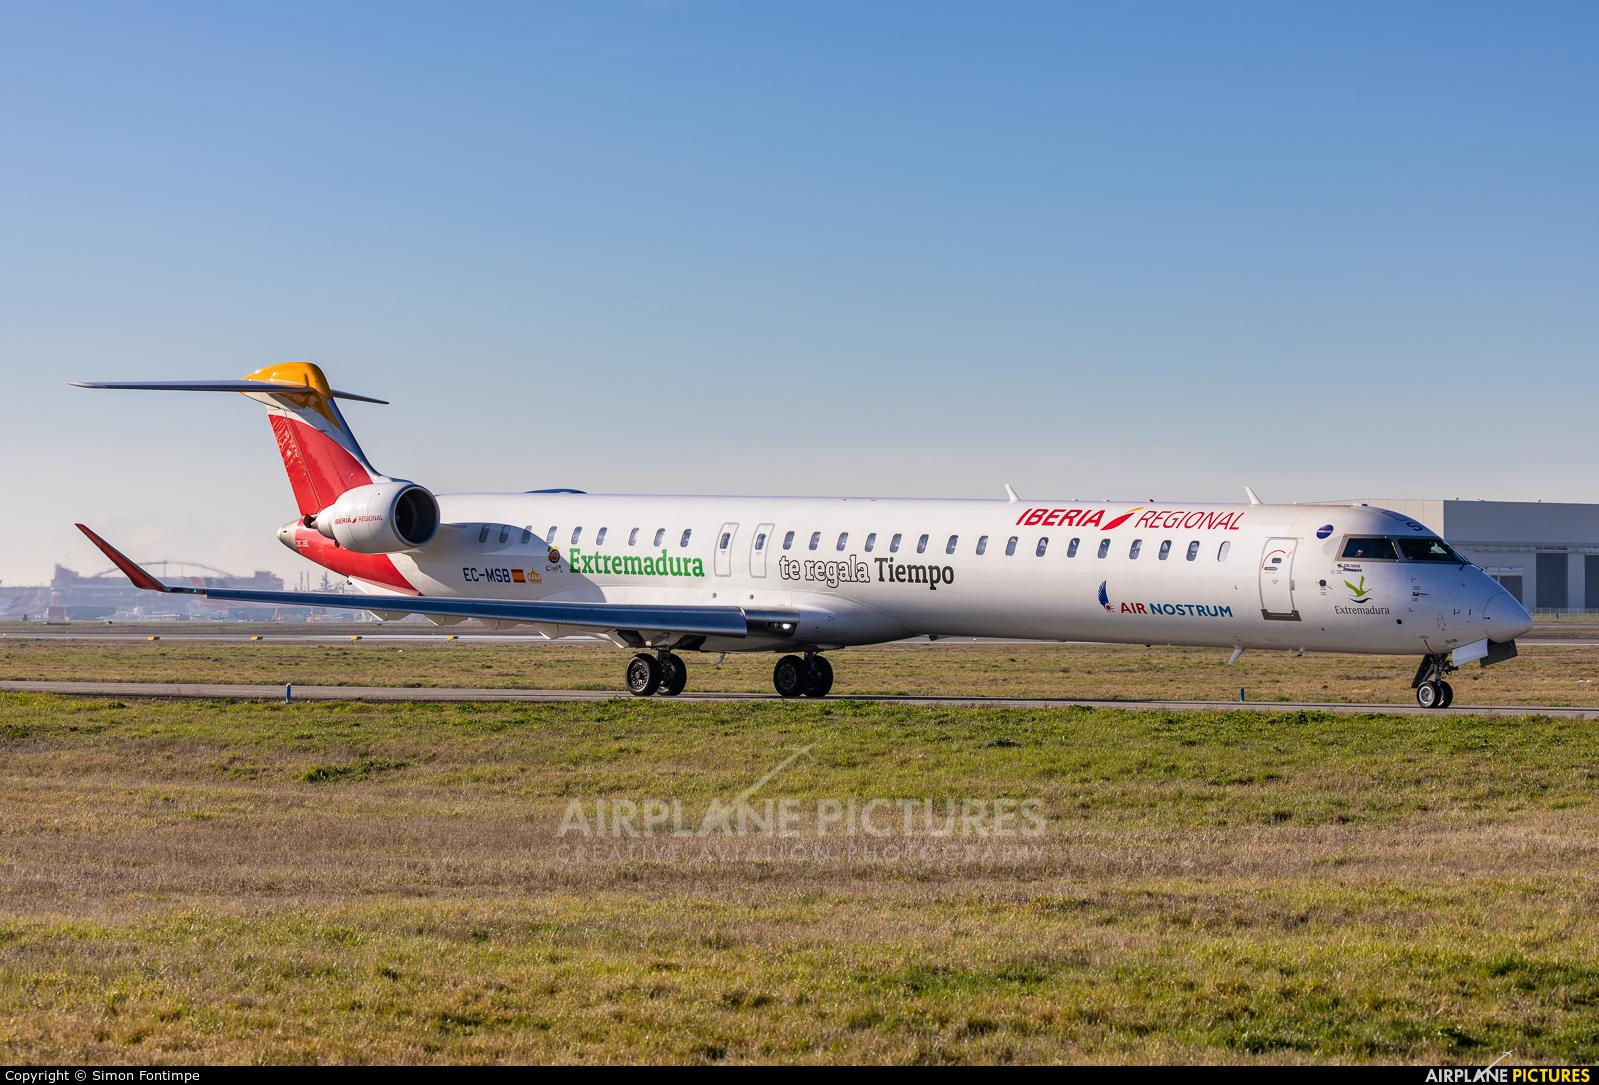 Air Nostrum - Iberia Regional EC-MSB aircraft at Toulouse - Blagnac